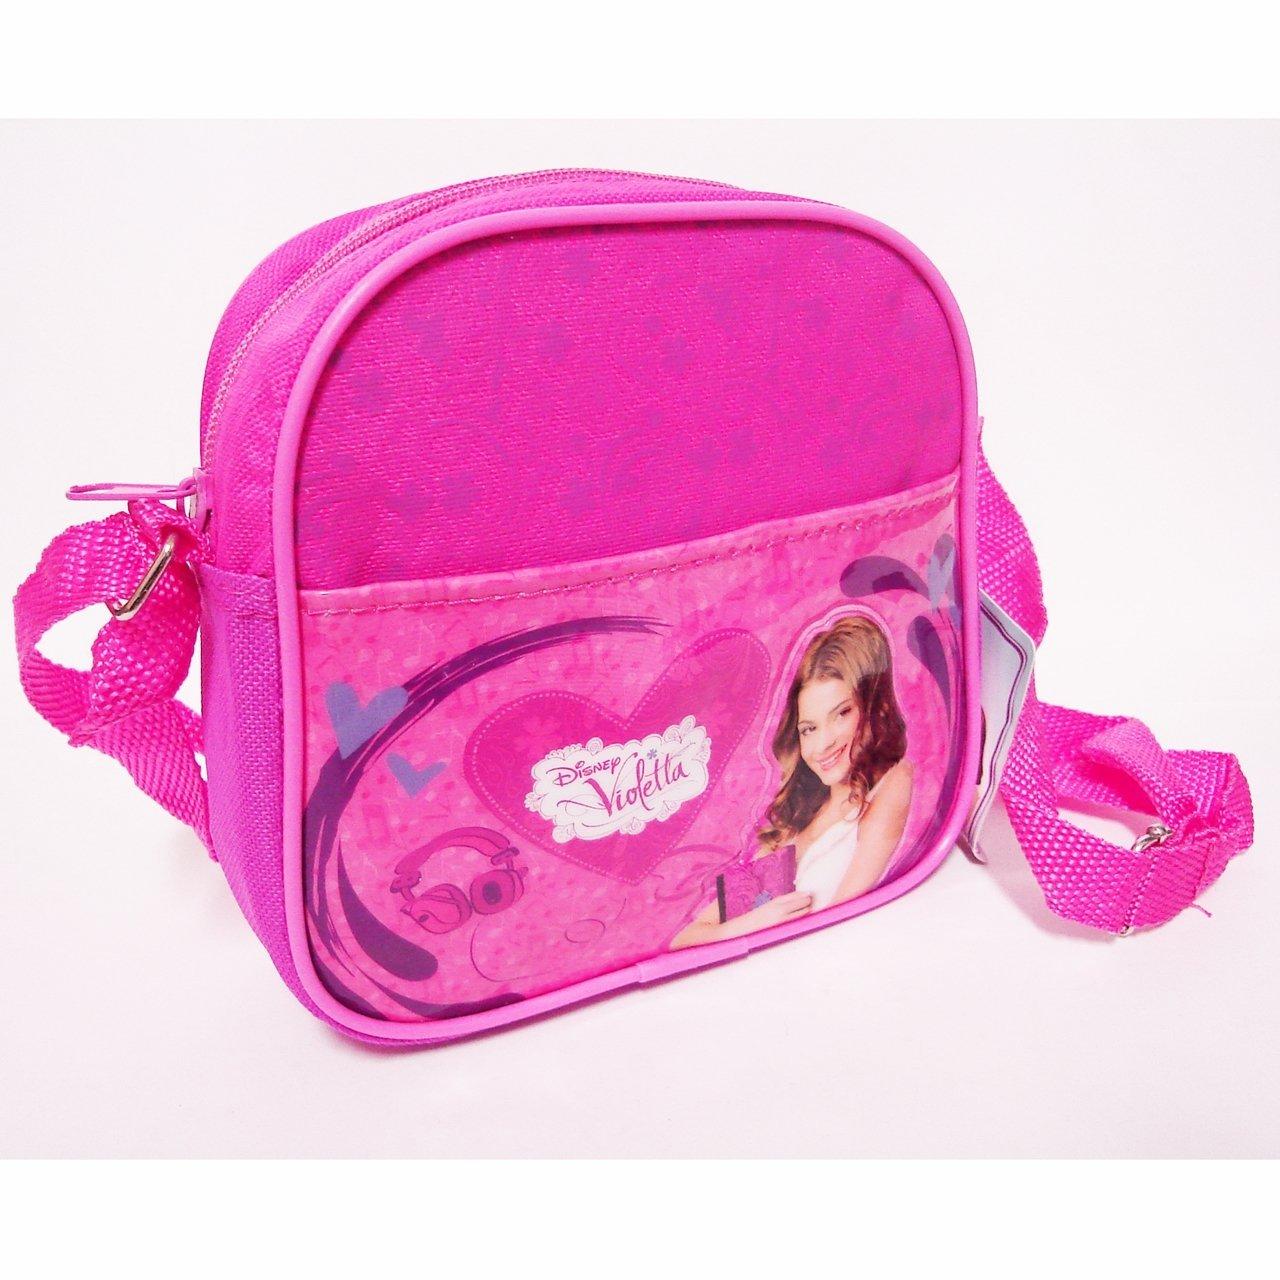 Bolso bandolera Violetta Disney Travel pequeño